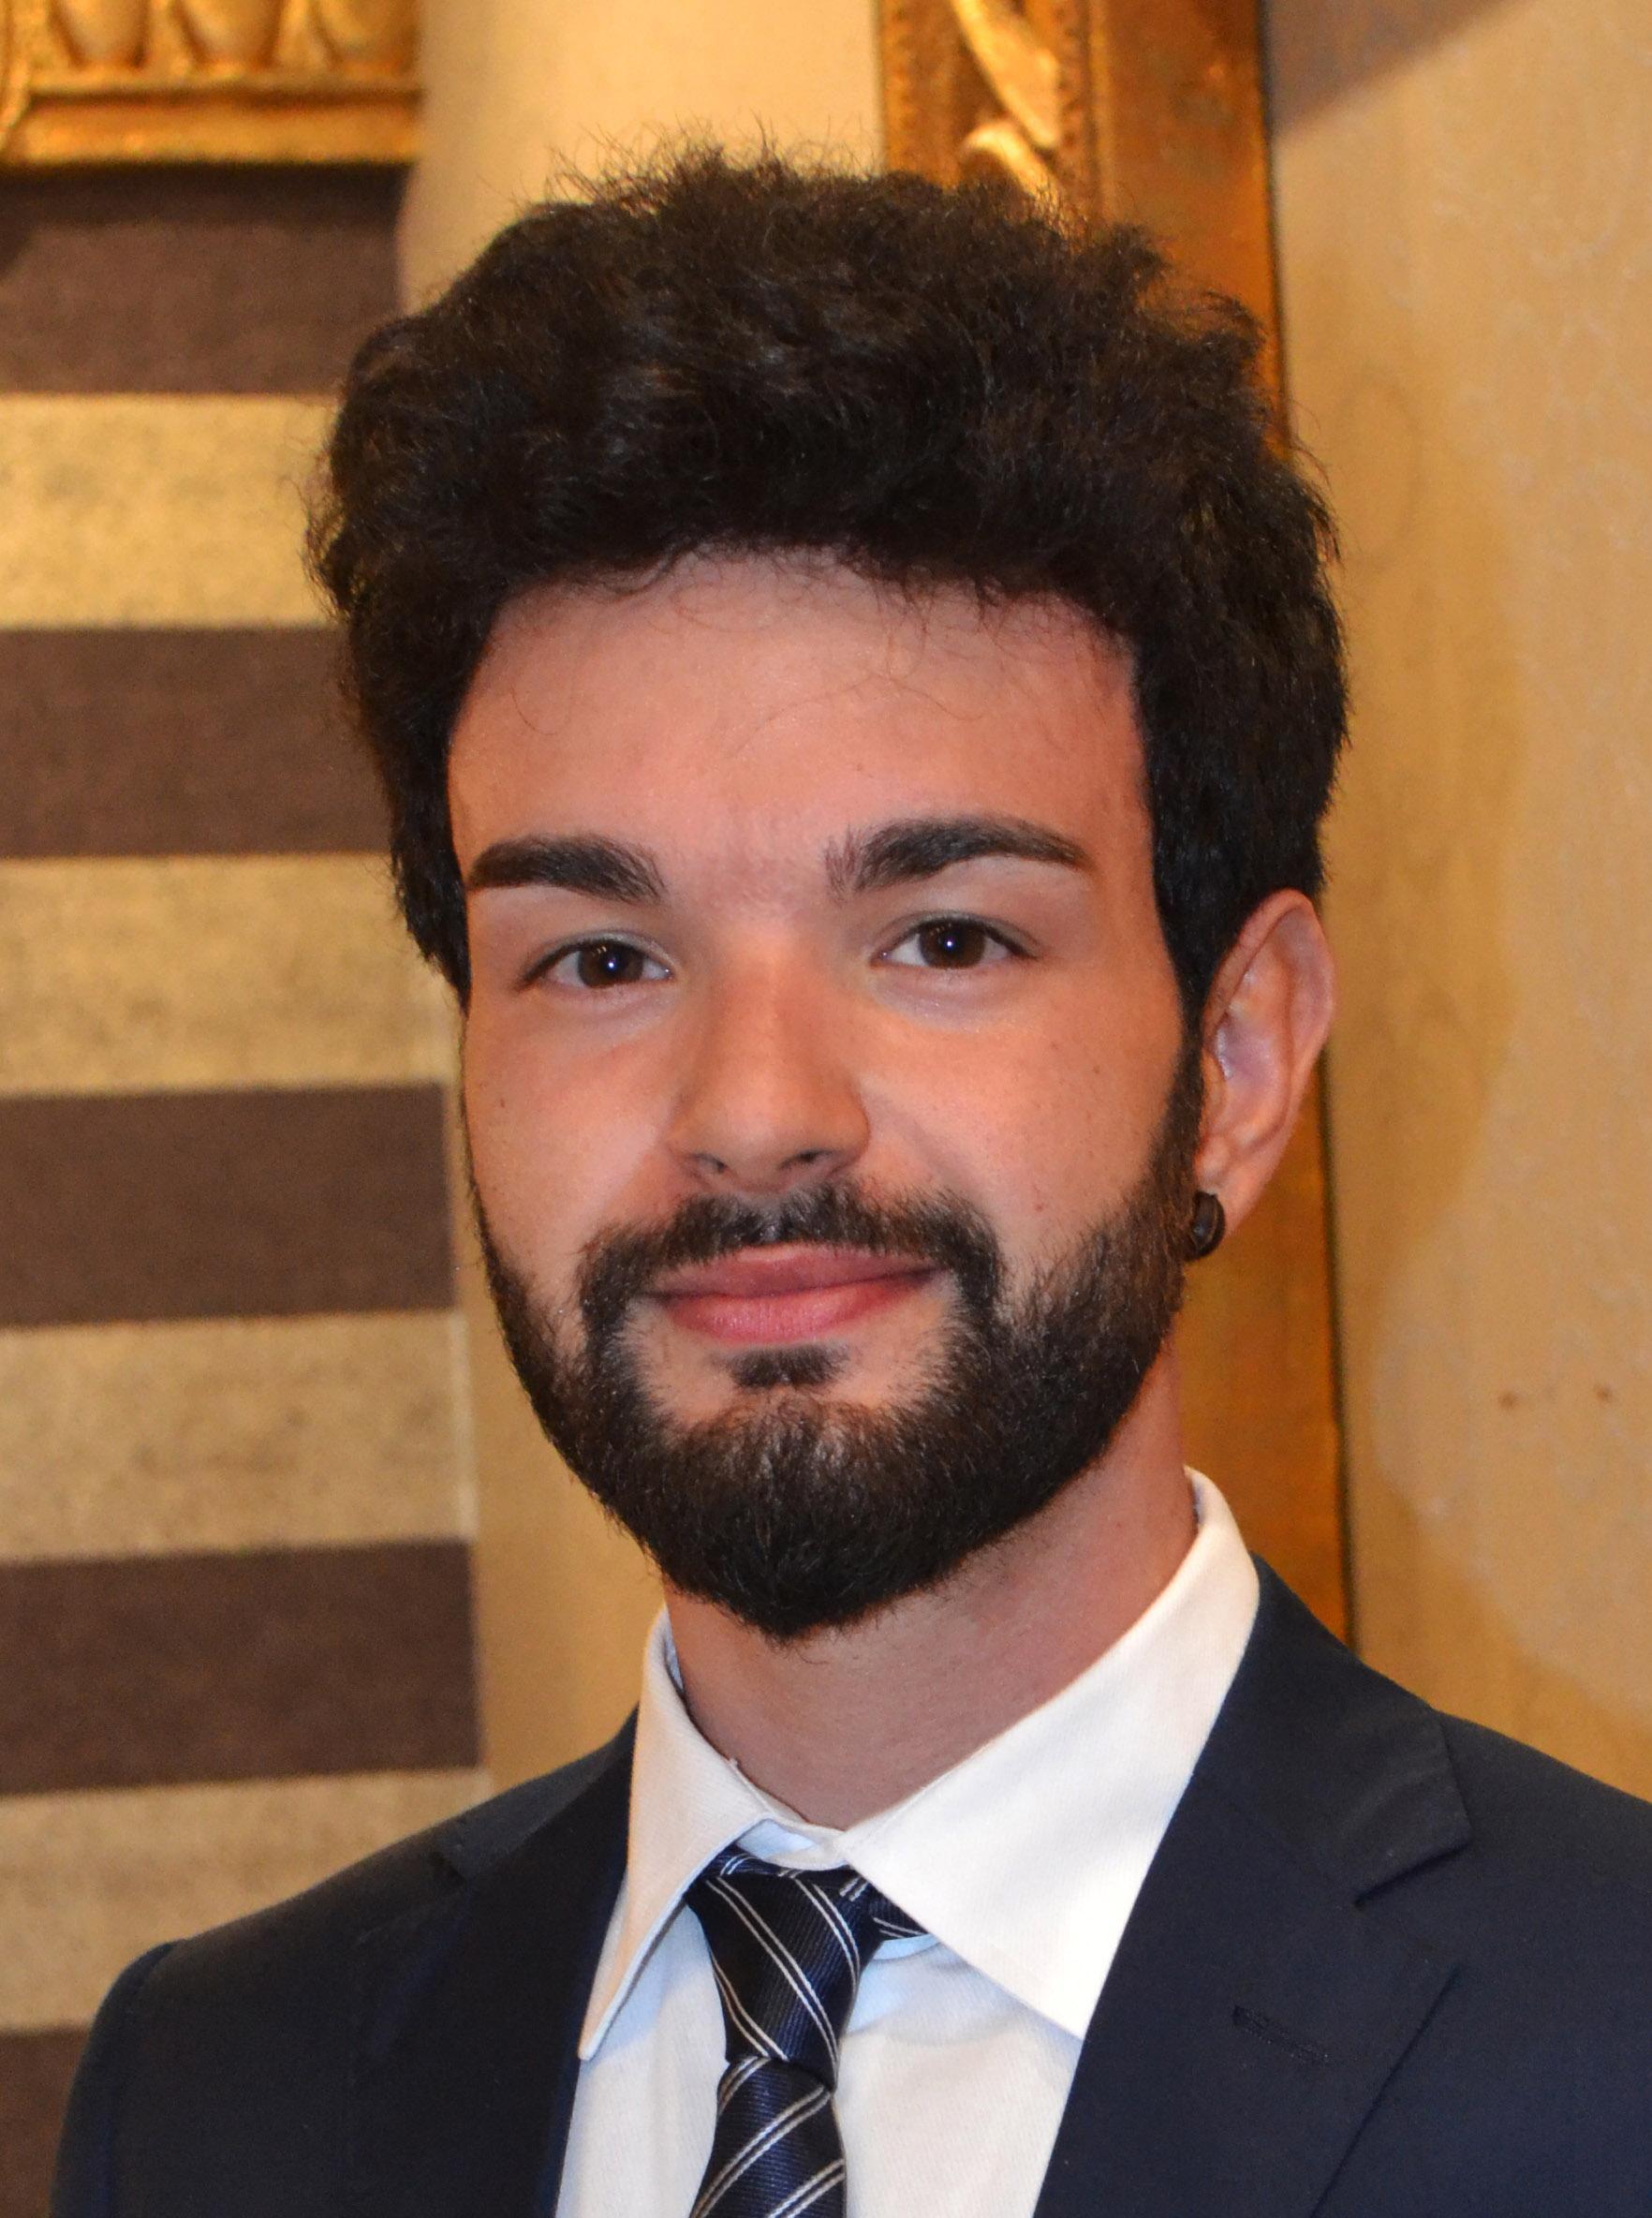 Marco Rosano : Ph.D. Student